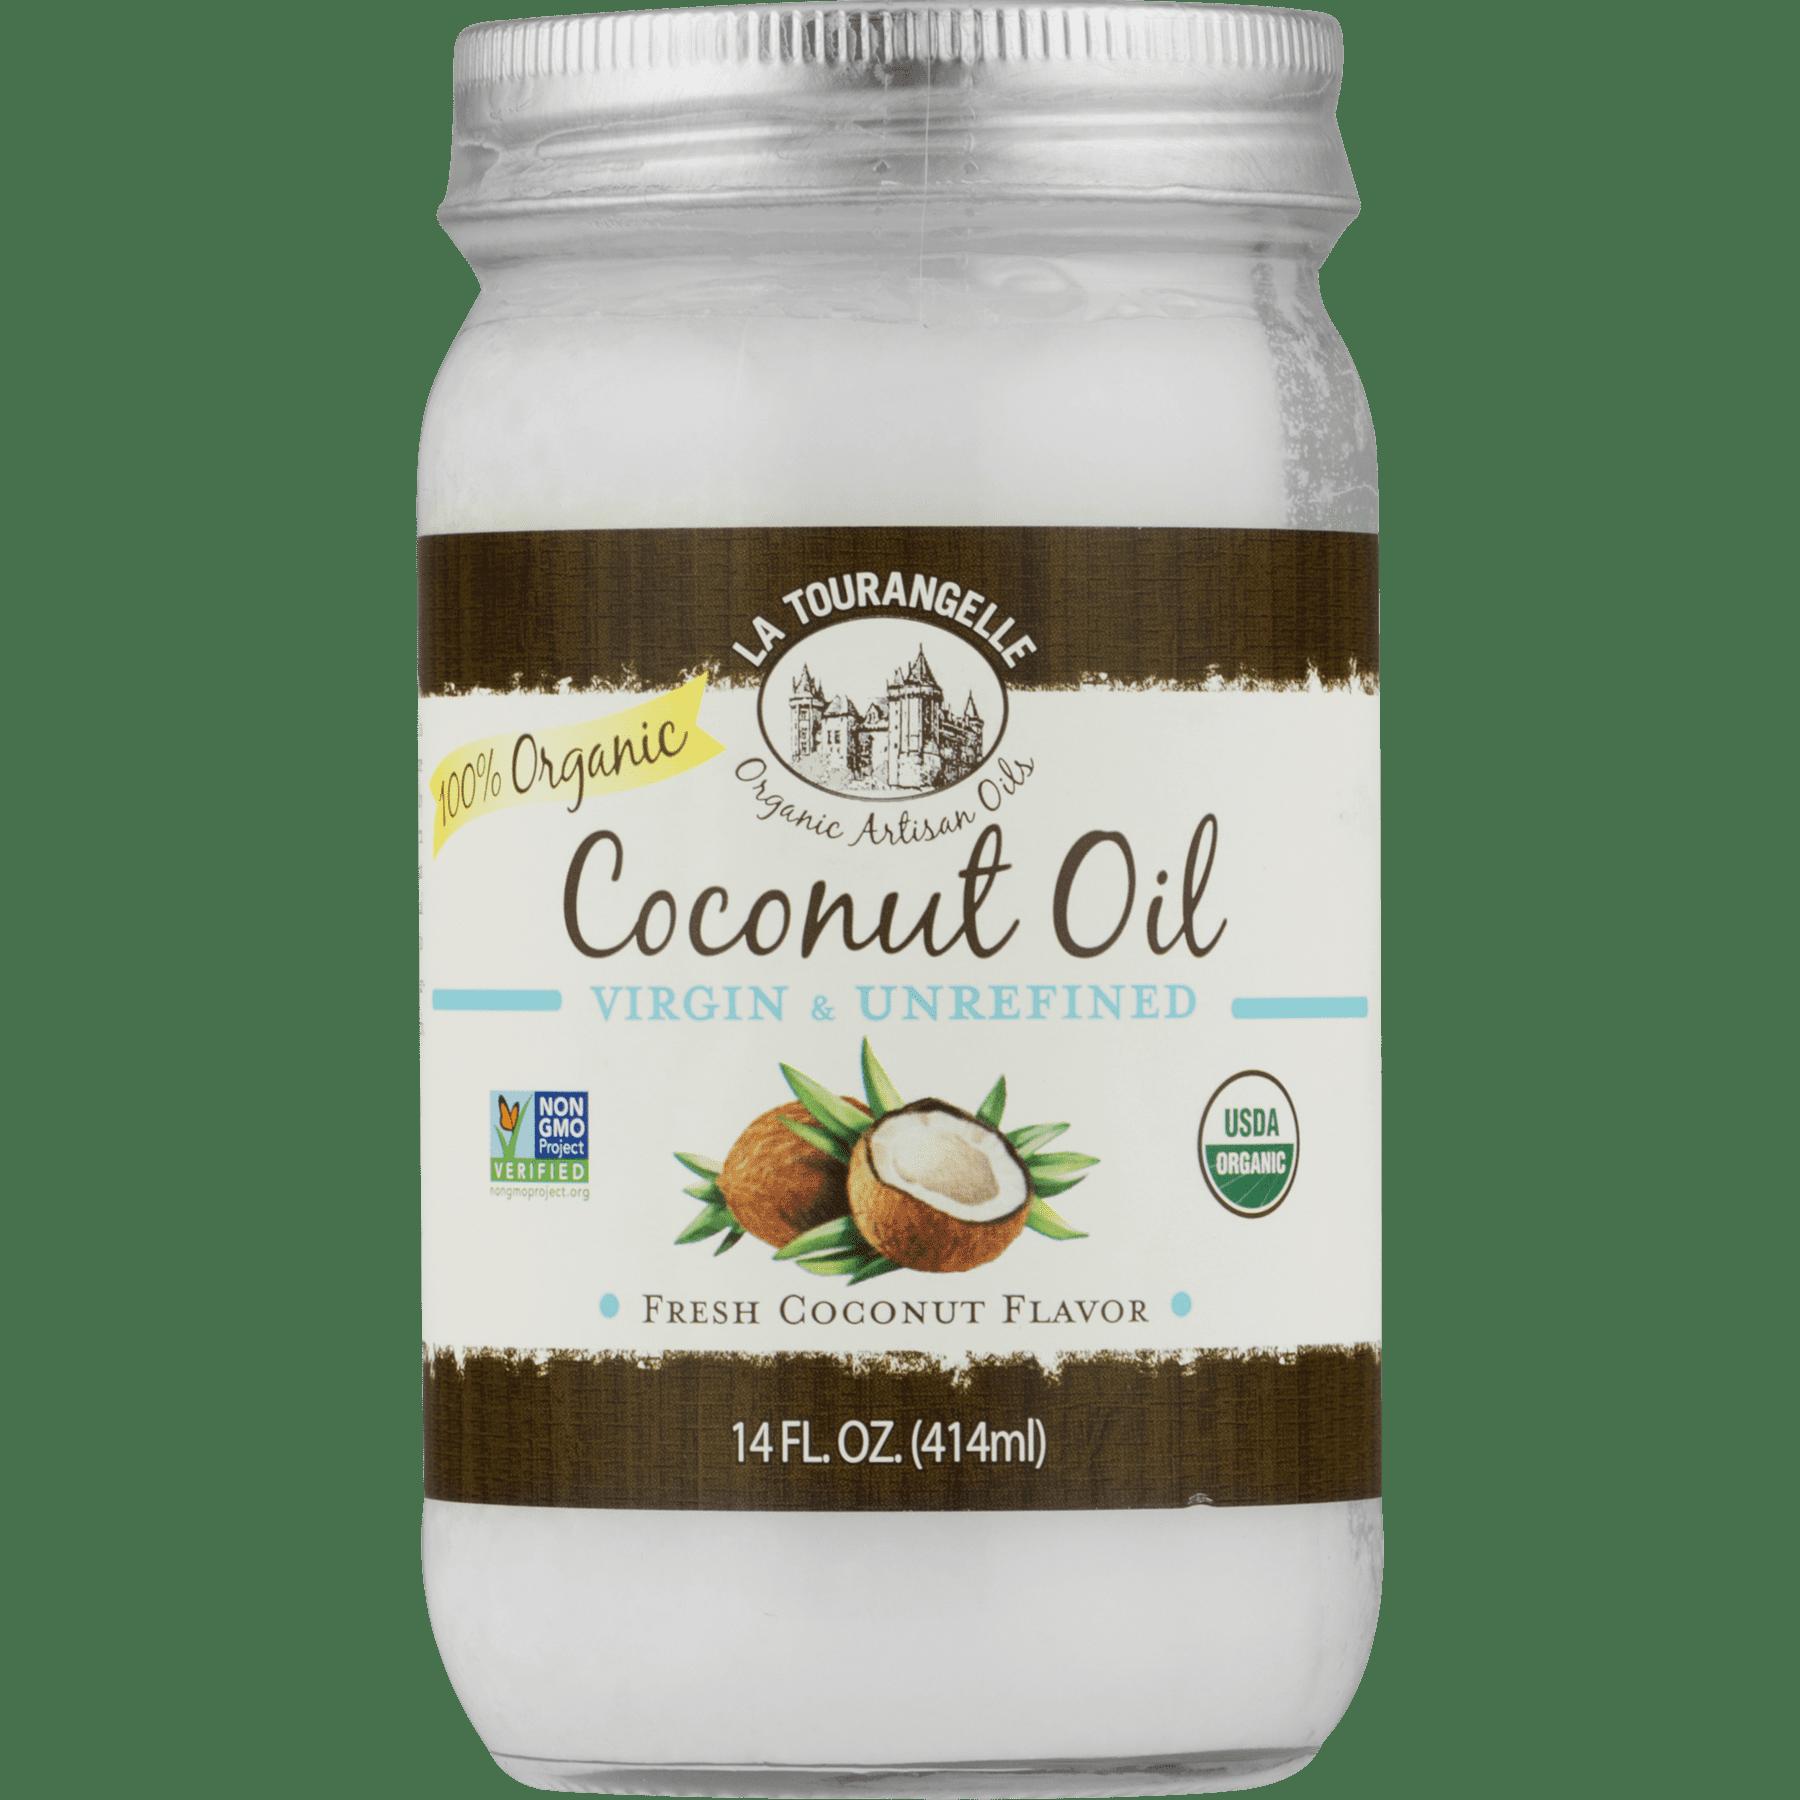 La Tourangelle, Organic Virgin Unrefined Coconut Oil, 14 fl oz (414 ml)